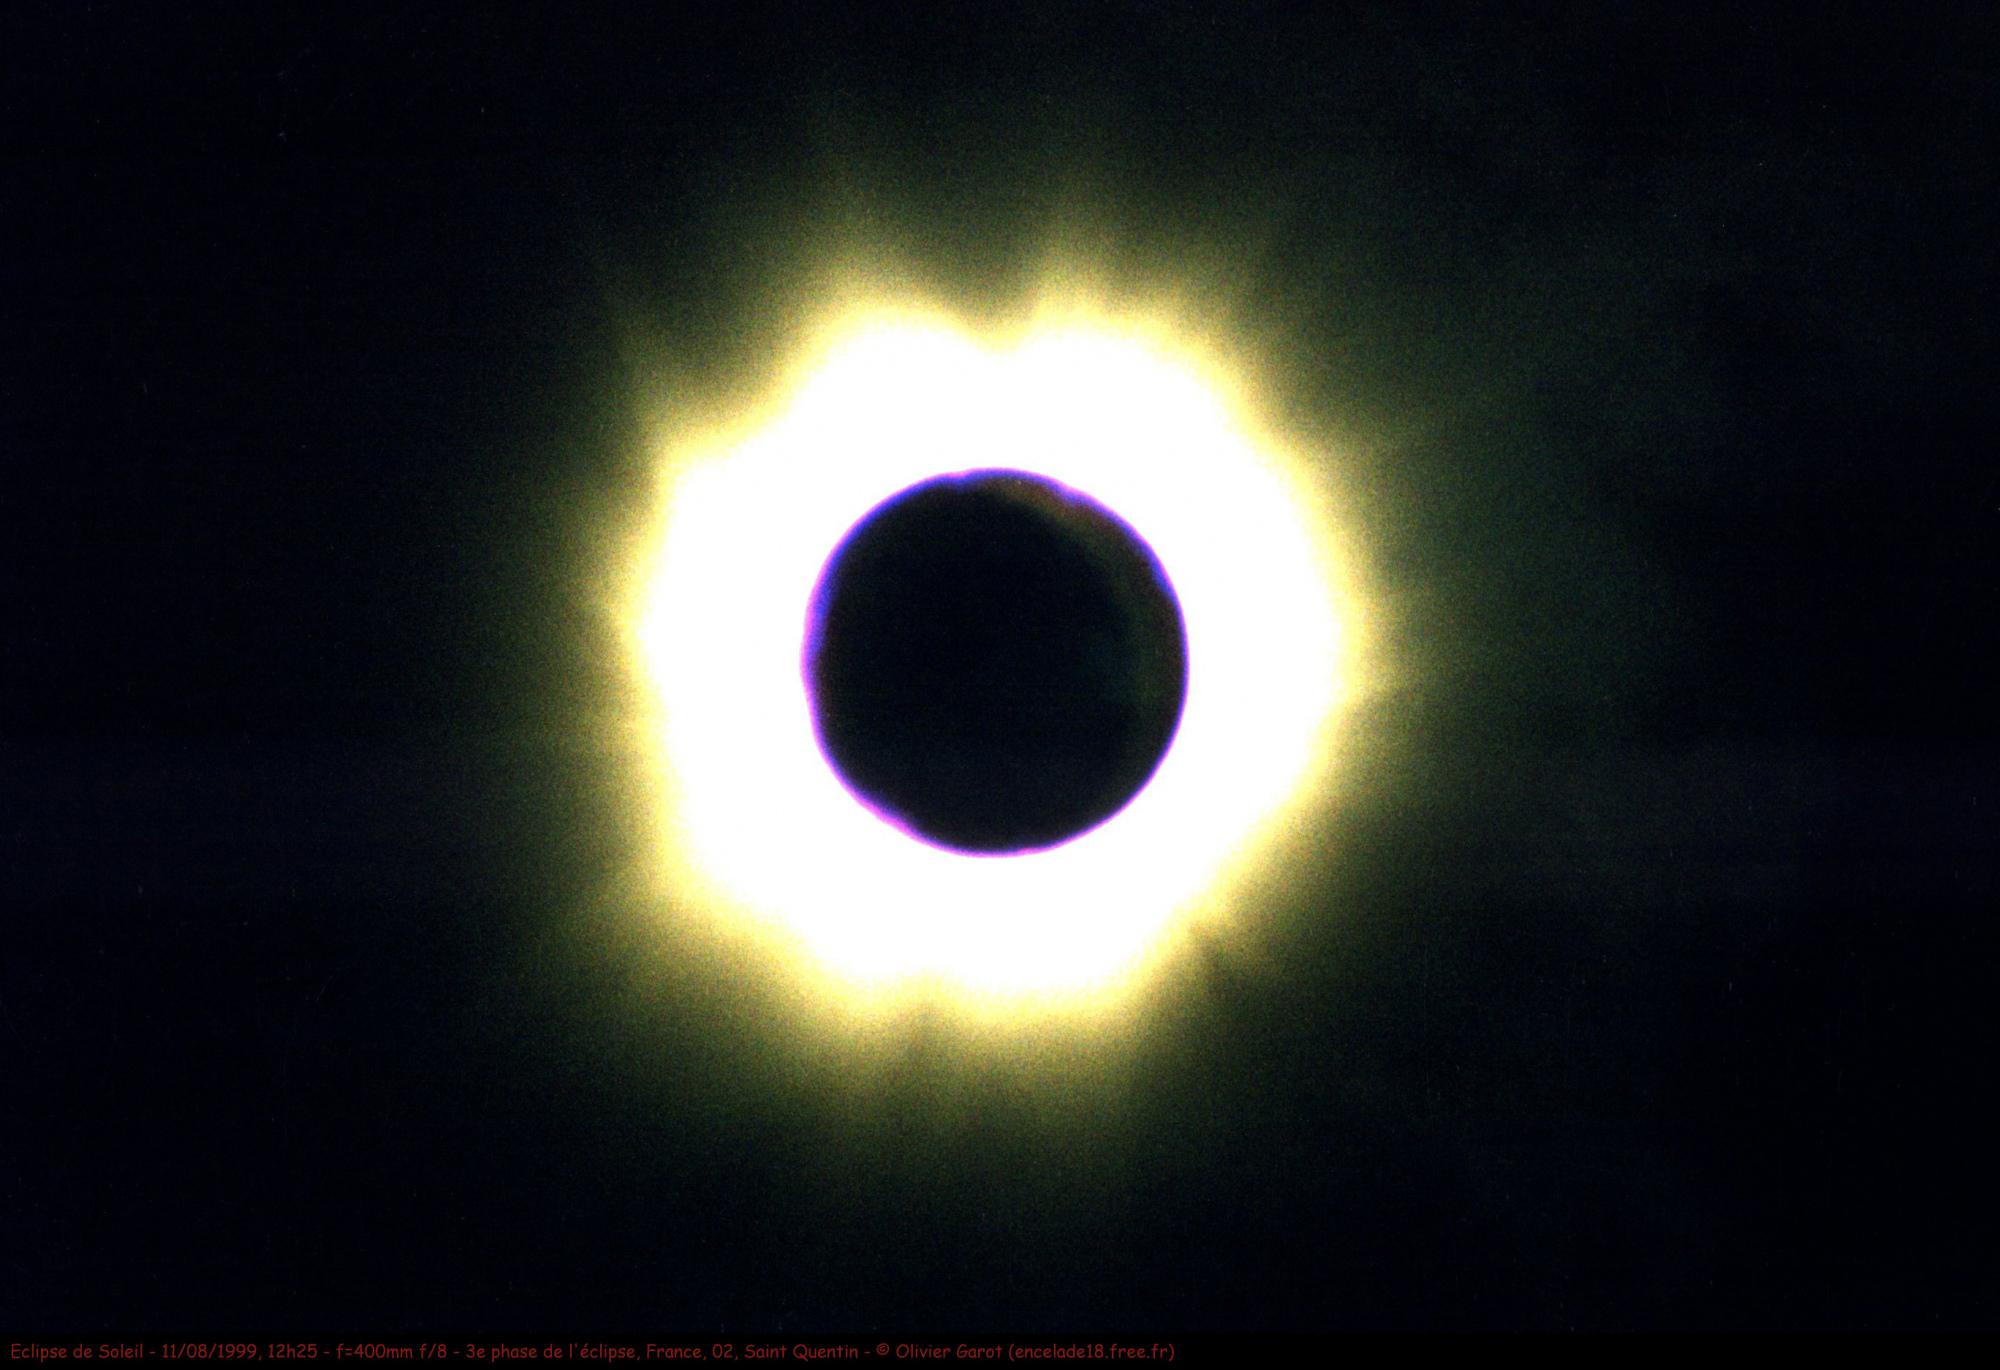 Soleil_1999_08_11_Eclipse_06_XRX_400mm_B_CROP2736x1824_og.thumb.jpg.fb079a9830e7168b74541f59c656c90e.jpg